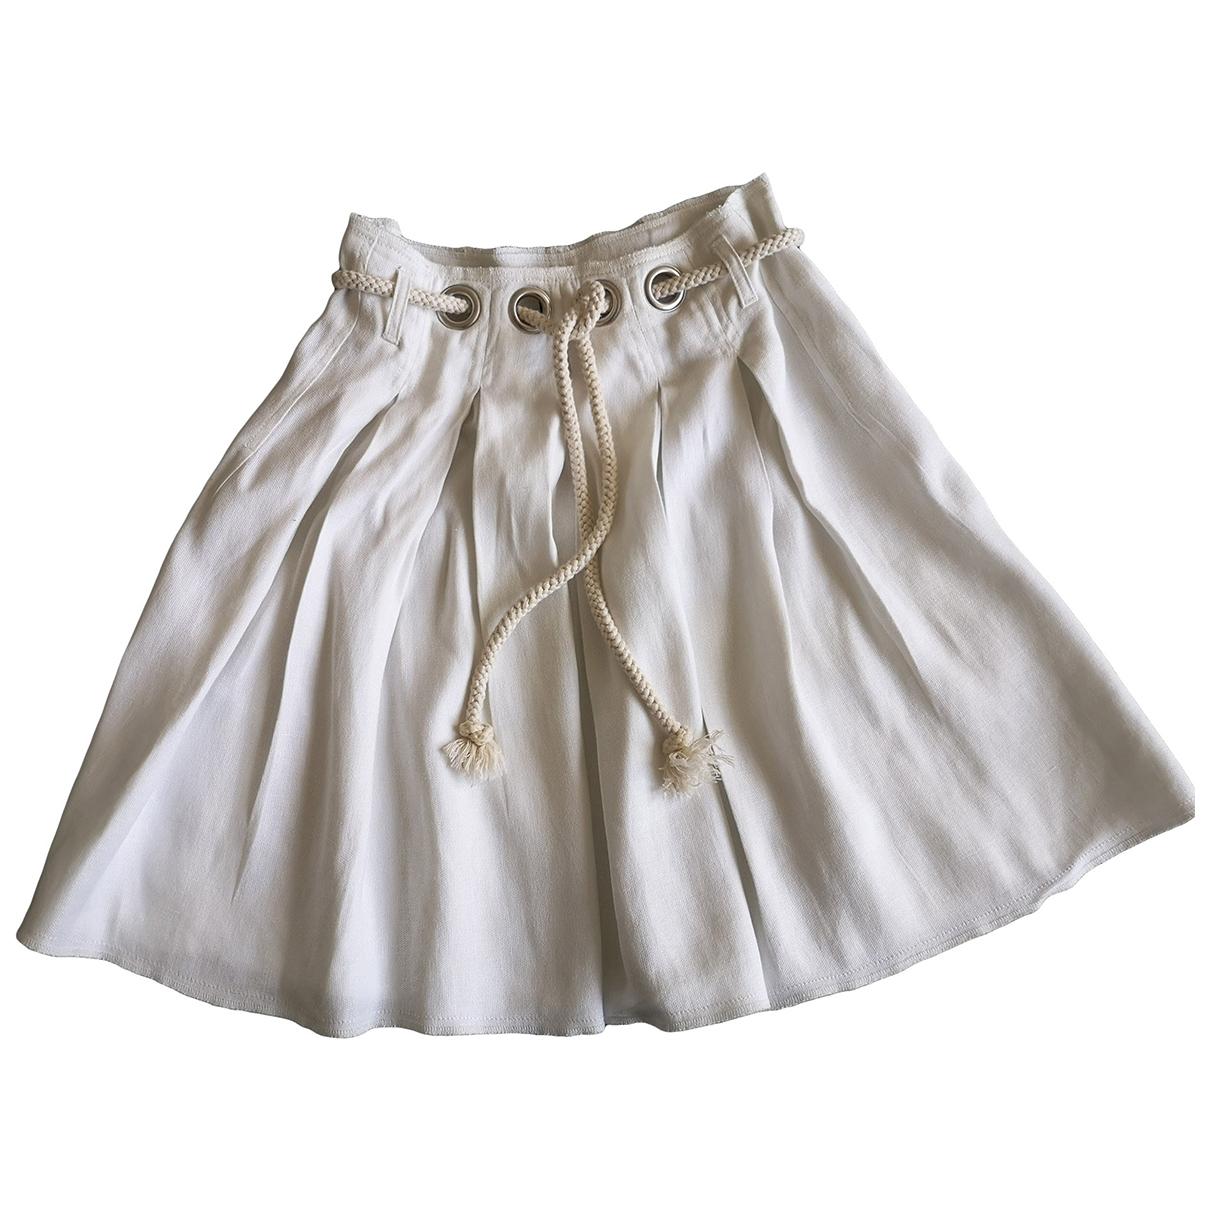 Sonia Rykiel - Jupe   pour femme en lin - blanc